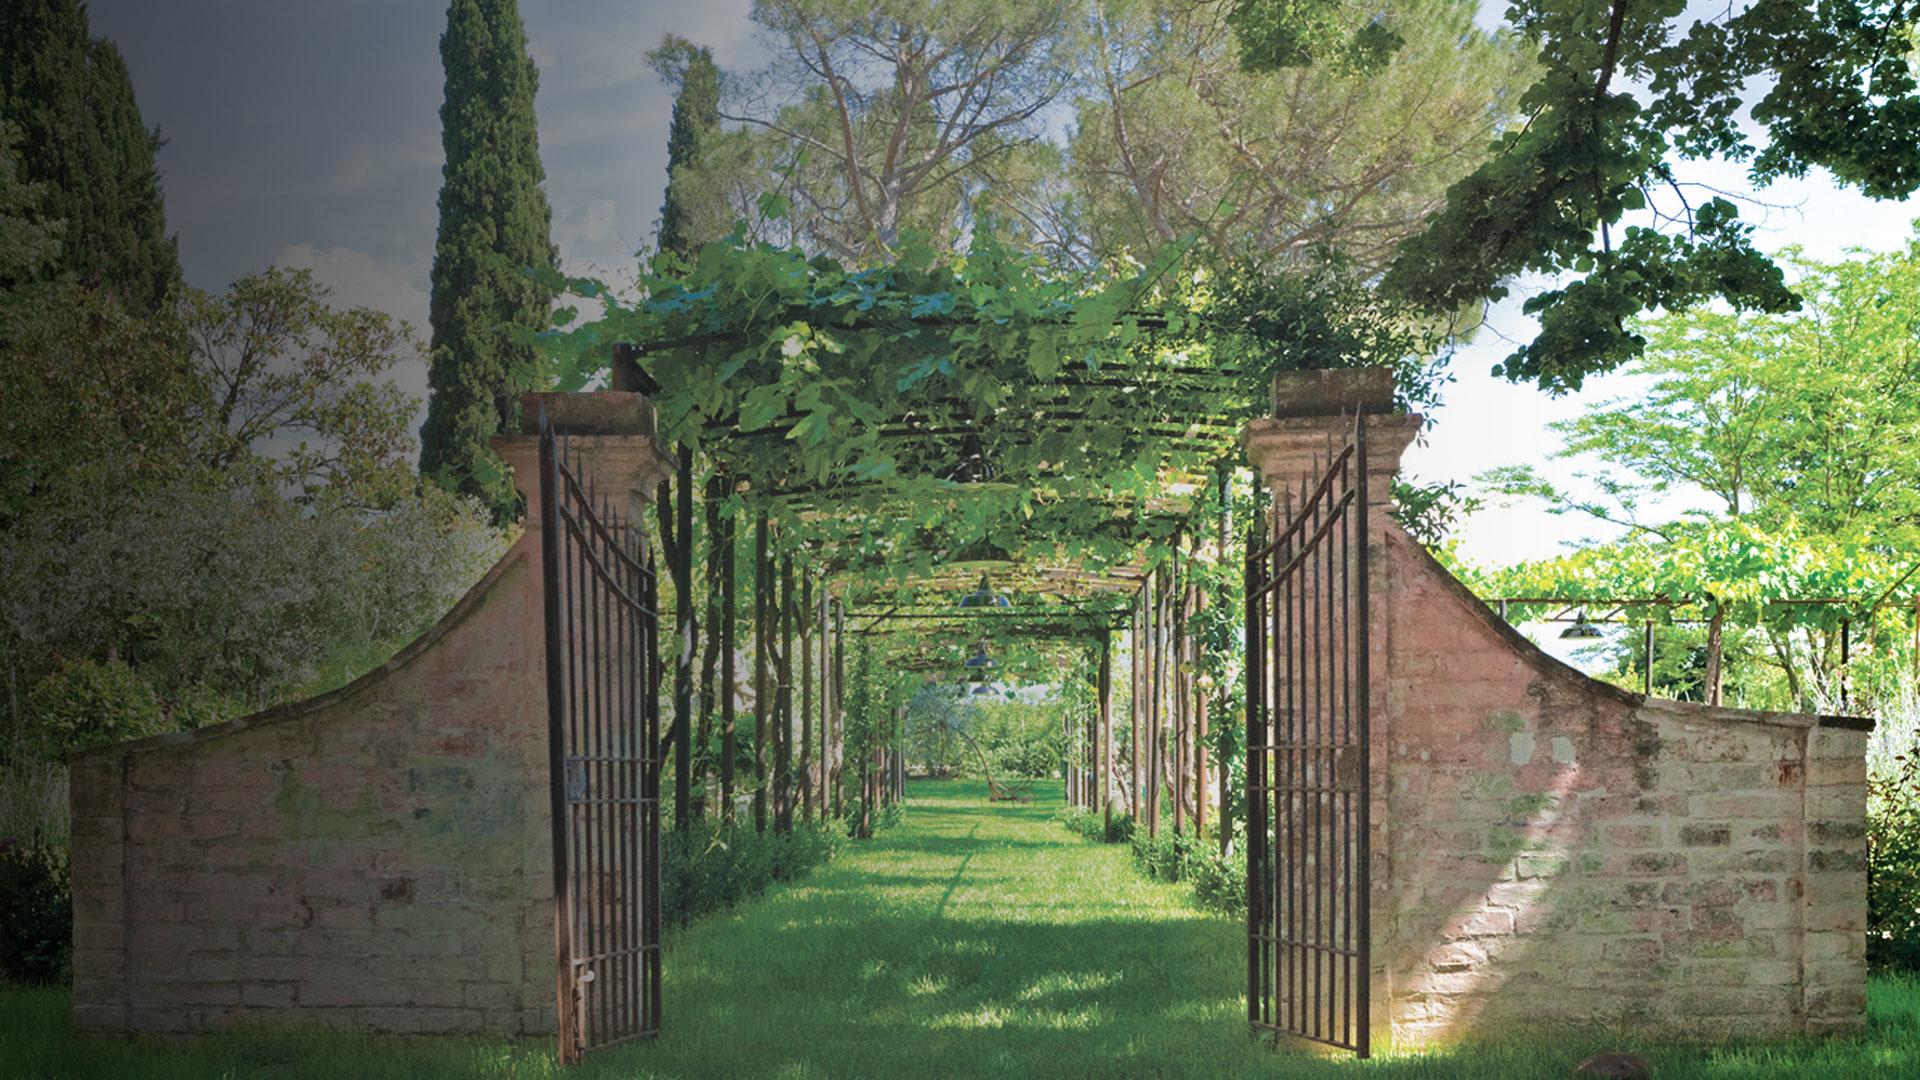 Dettaglio giardino Sede barbanera